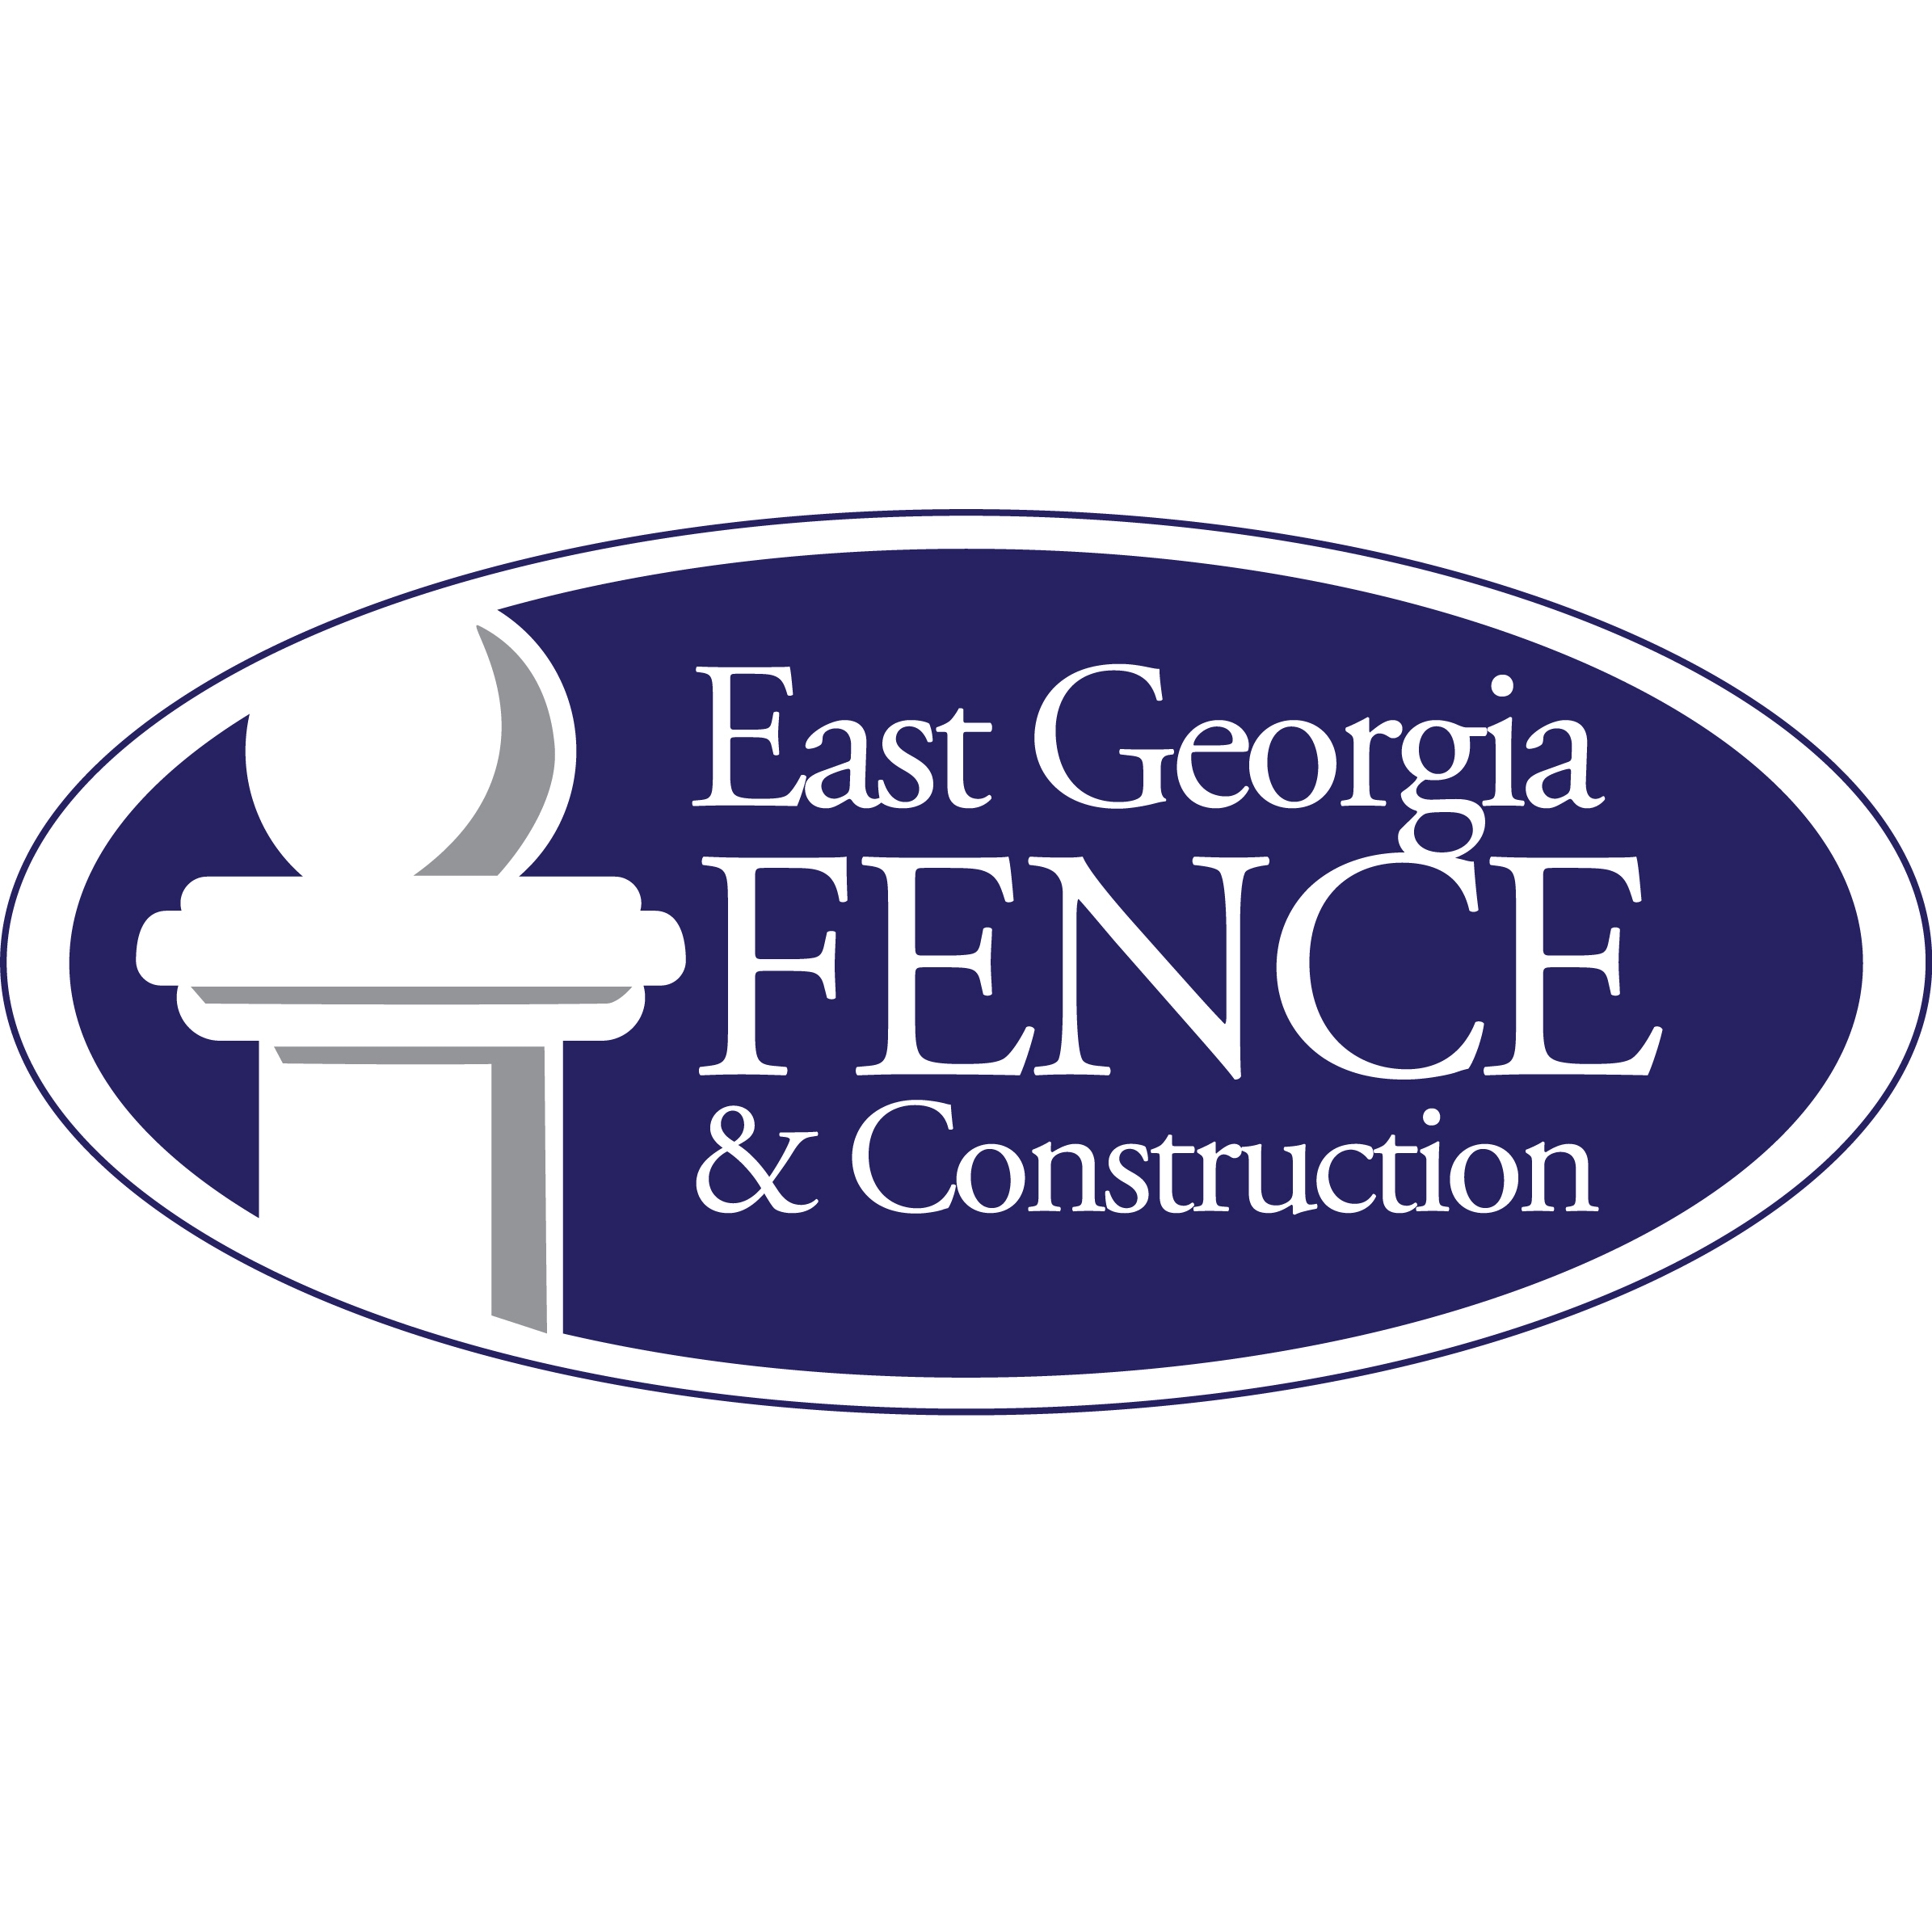 East Georgia Fence